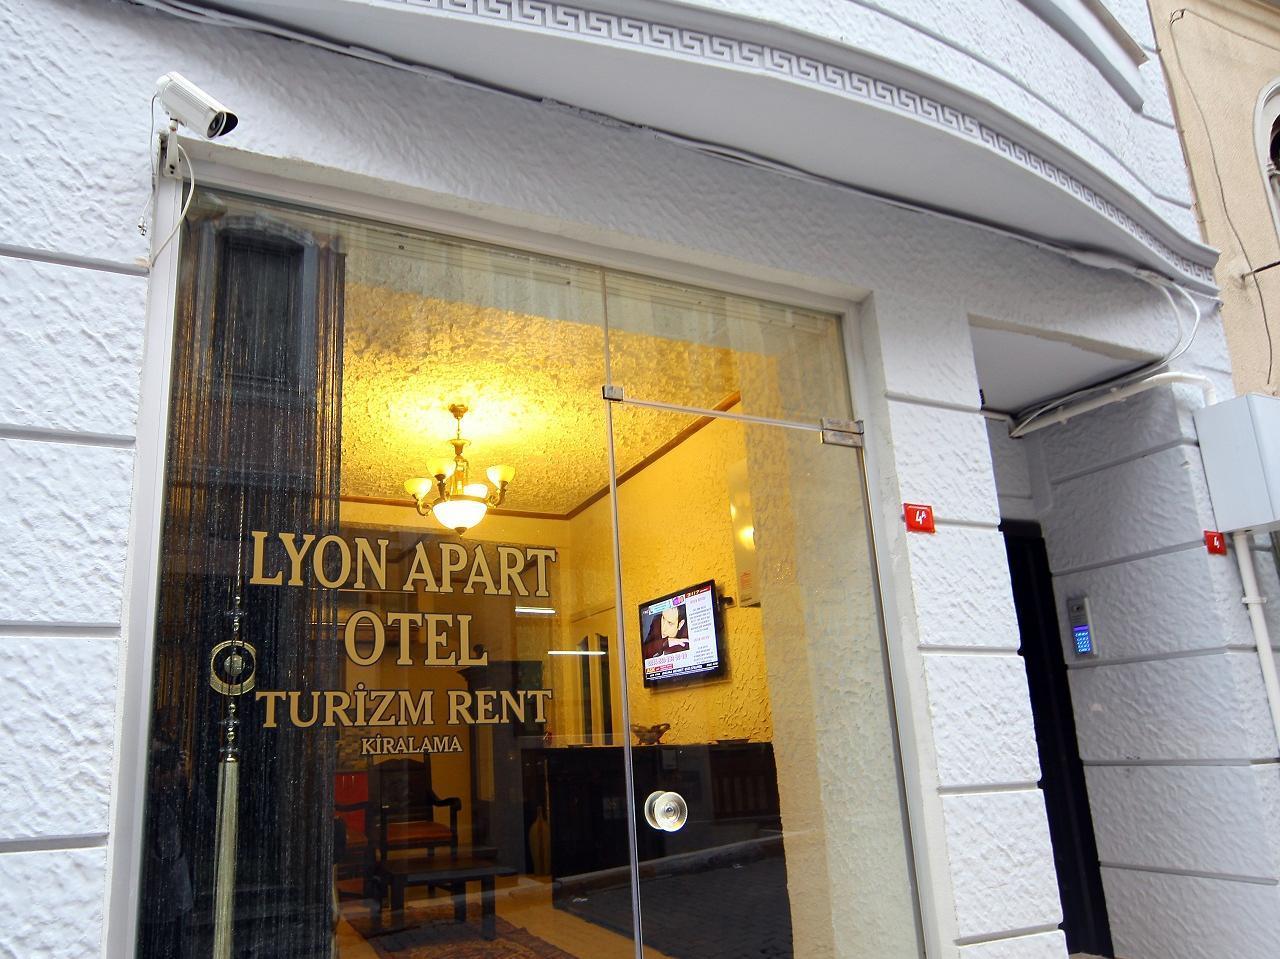 Lyon Apart Hotel